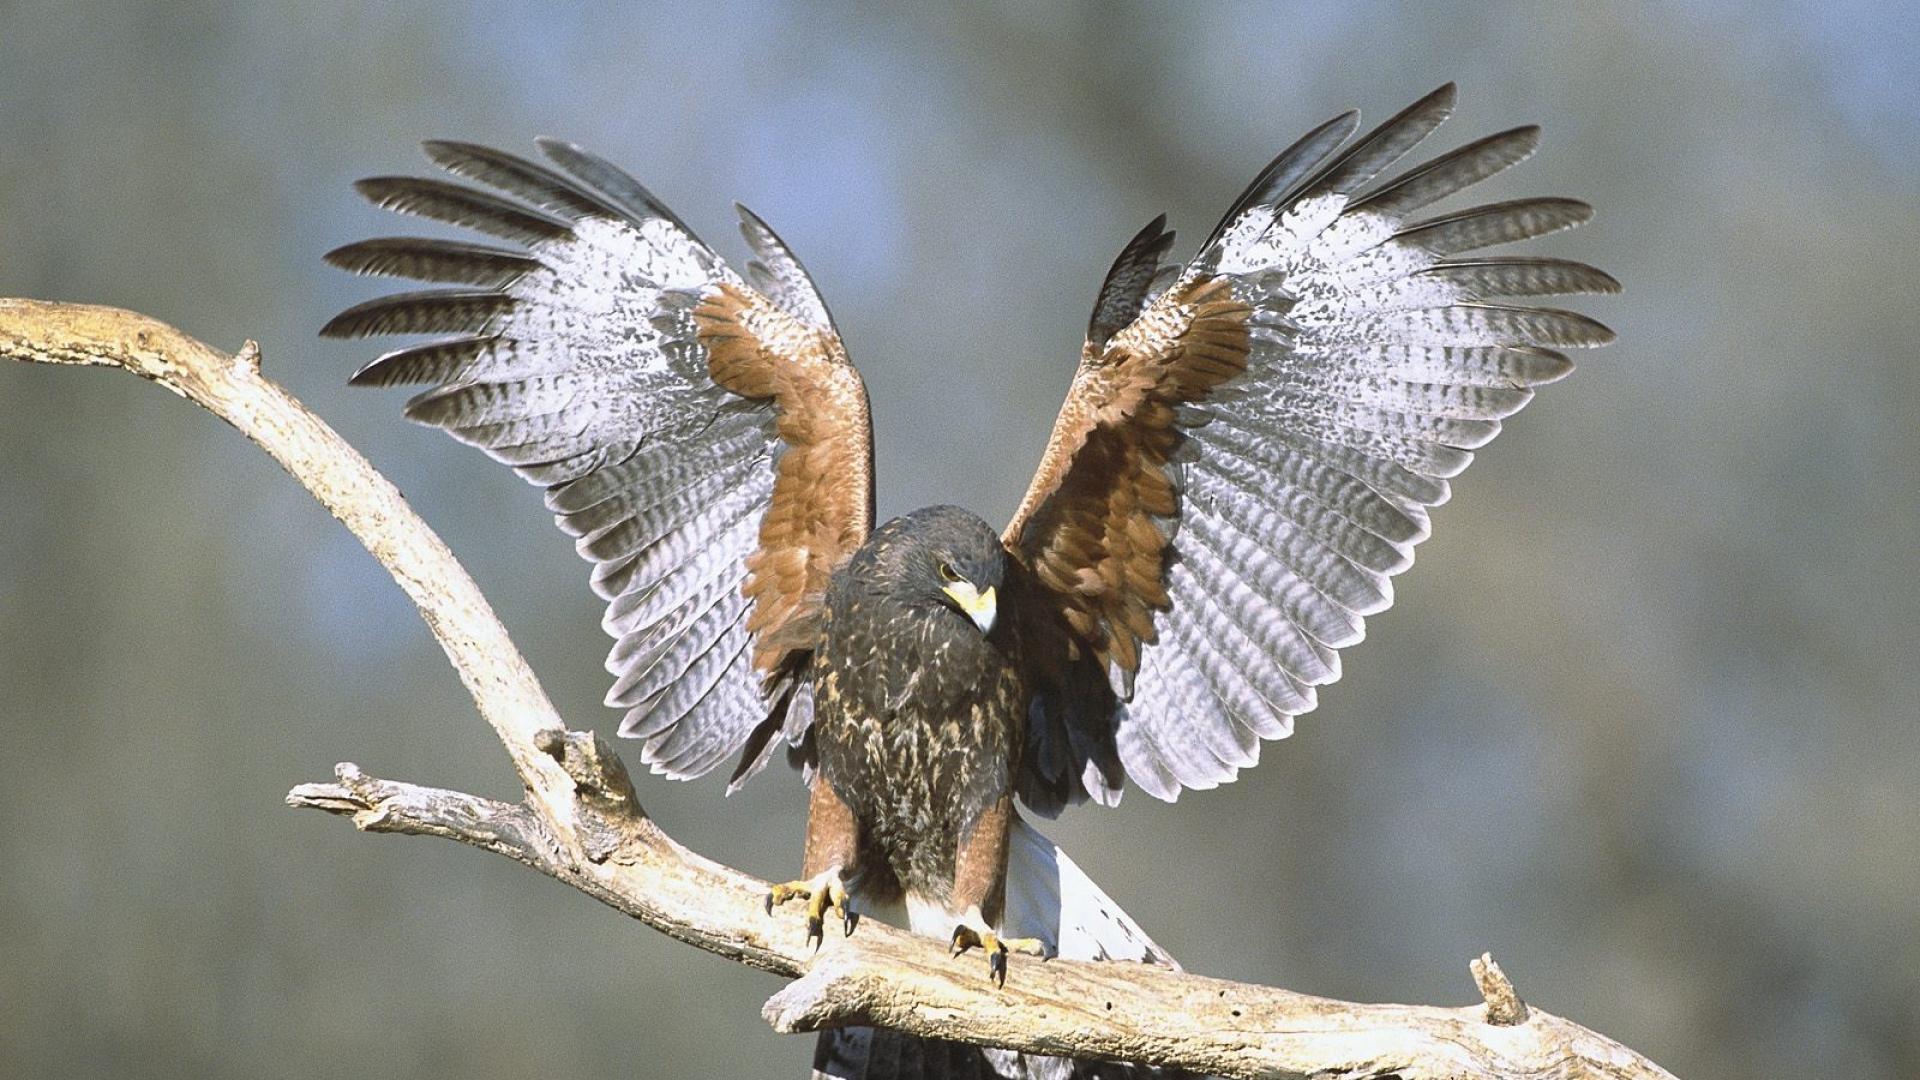 Download Wallpaper 1920x1080 Wings Bird Hawk Branch